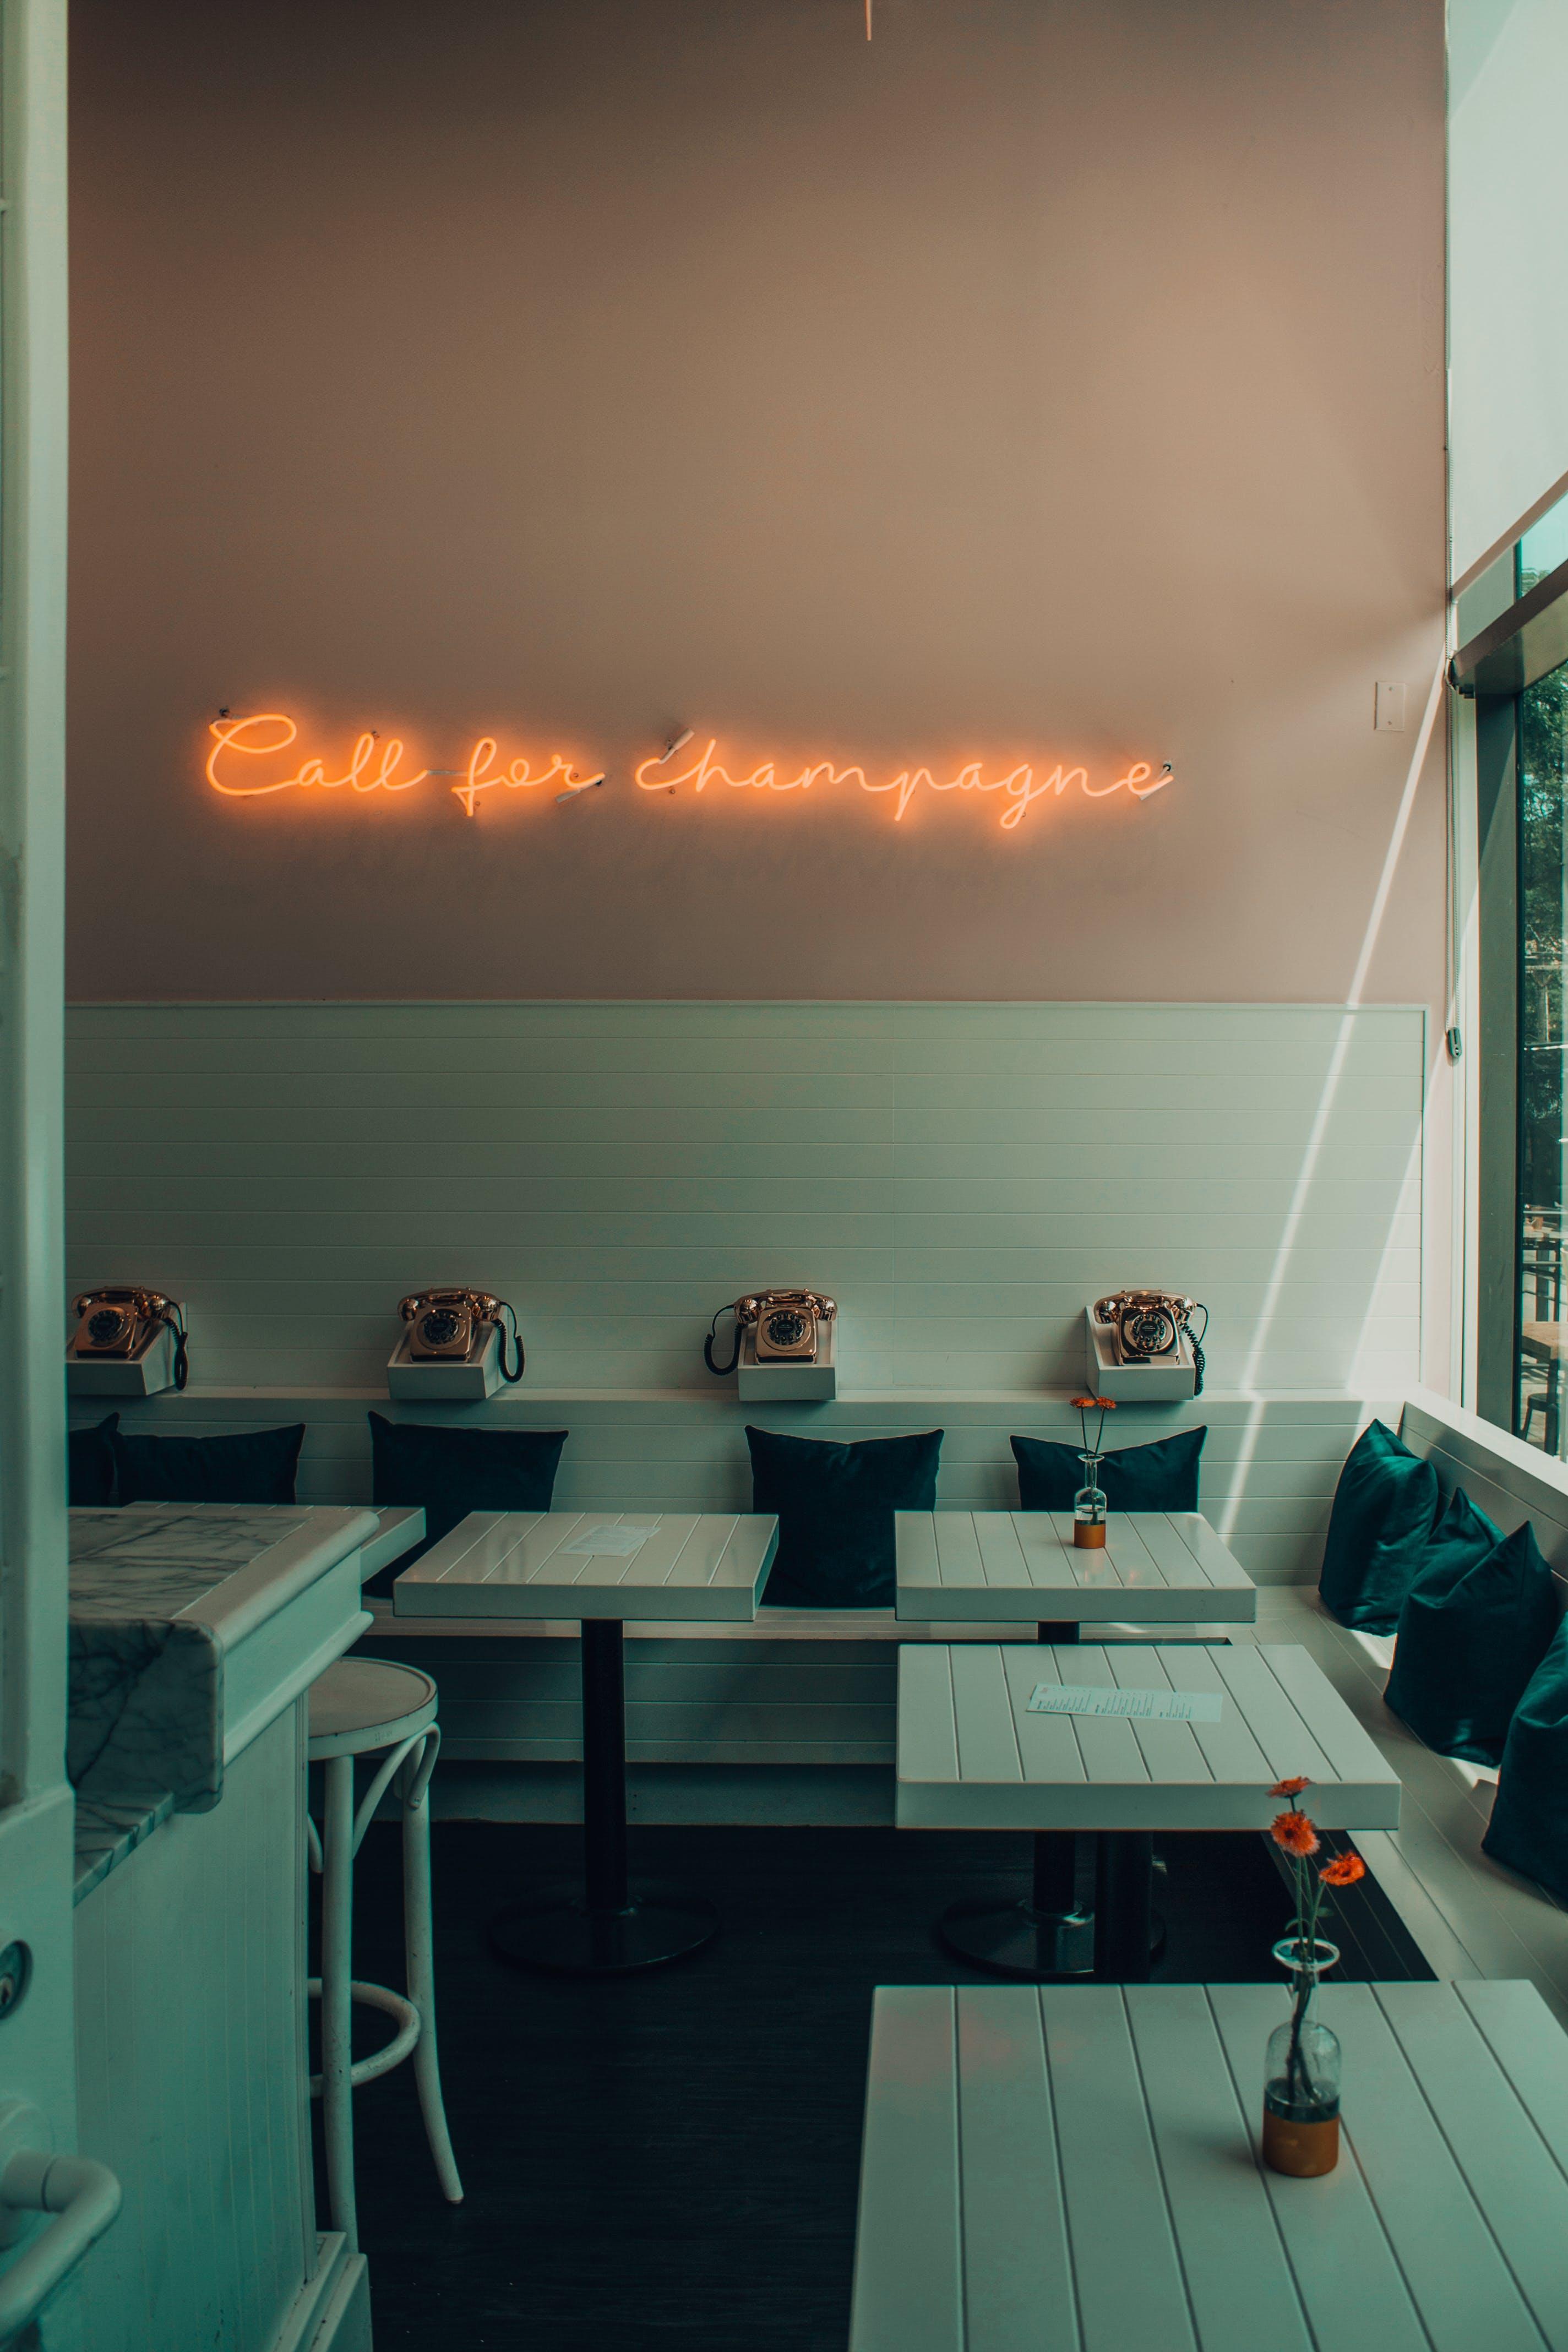 Orange Neon Light Signage On Wall